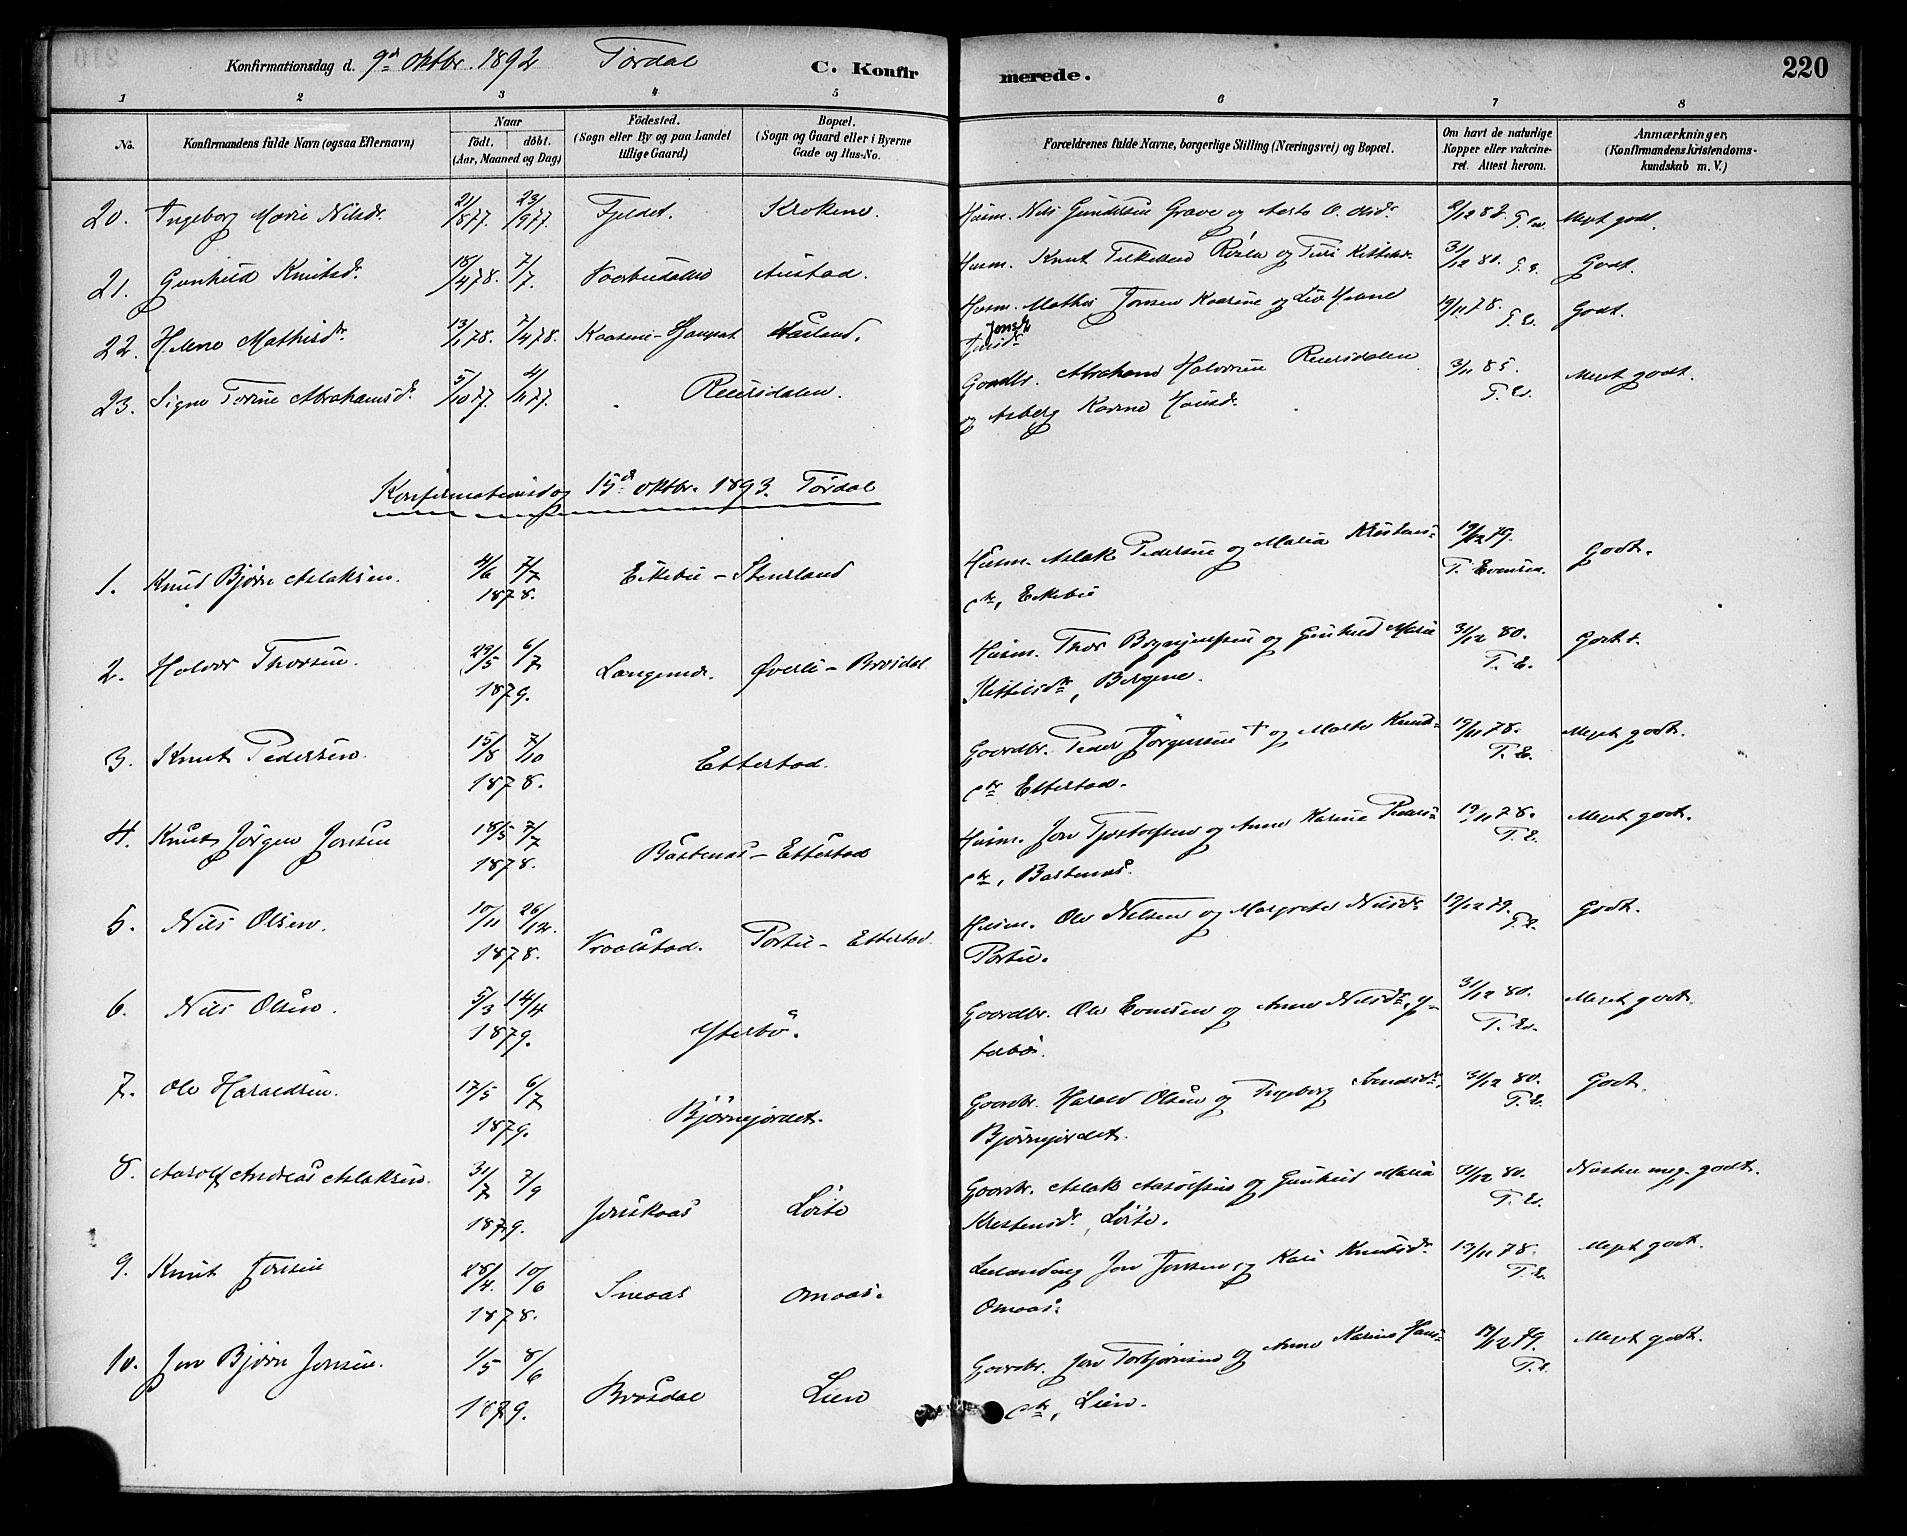 SAKO, Drangedal kirkebøker, F/Fa/L0010: Ministerialbok nr. 10 /2, 1885-1894, s. 220